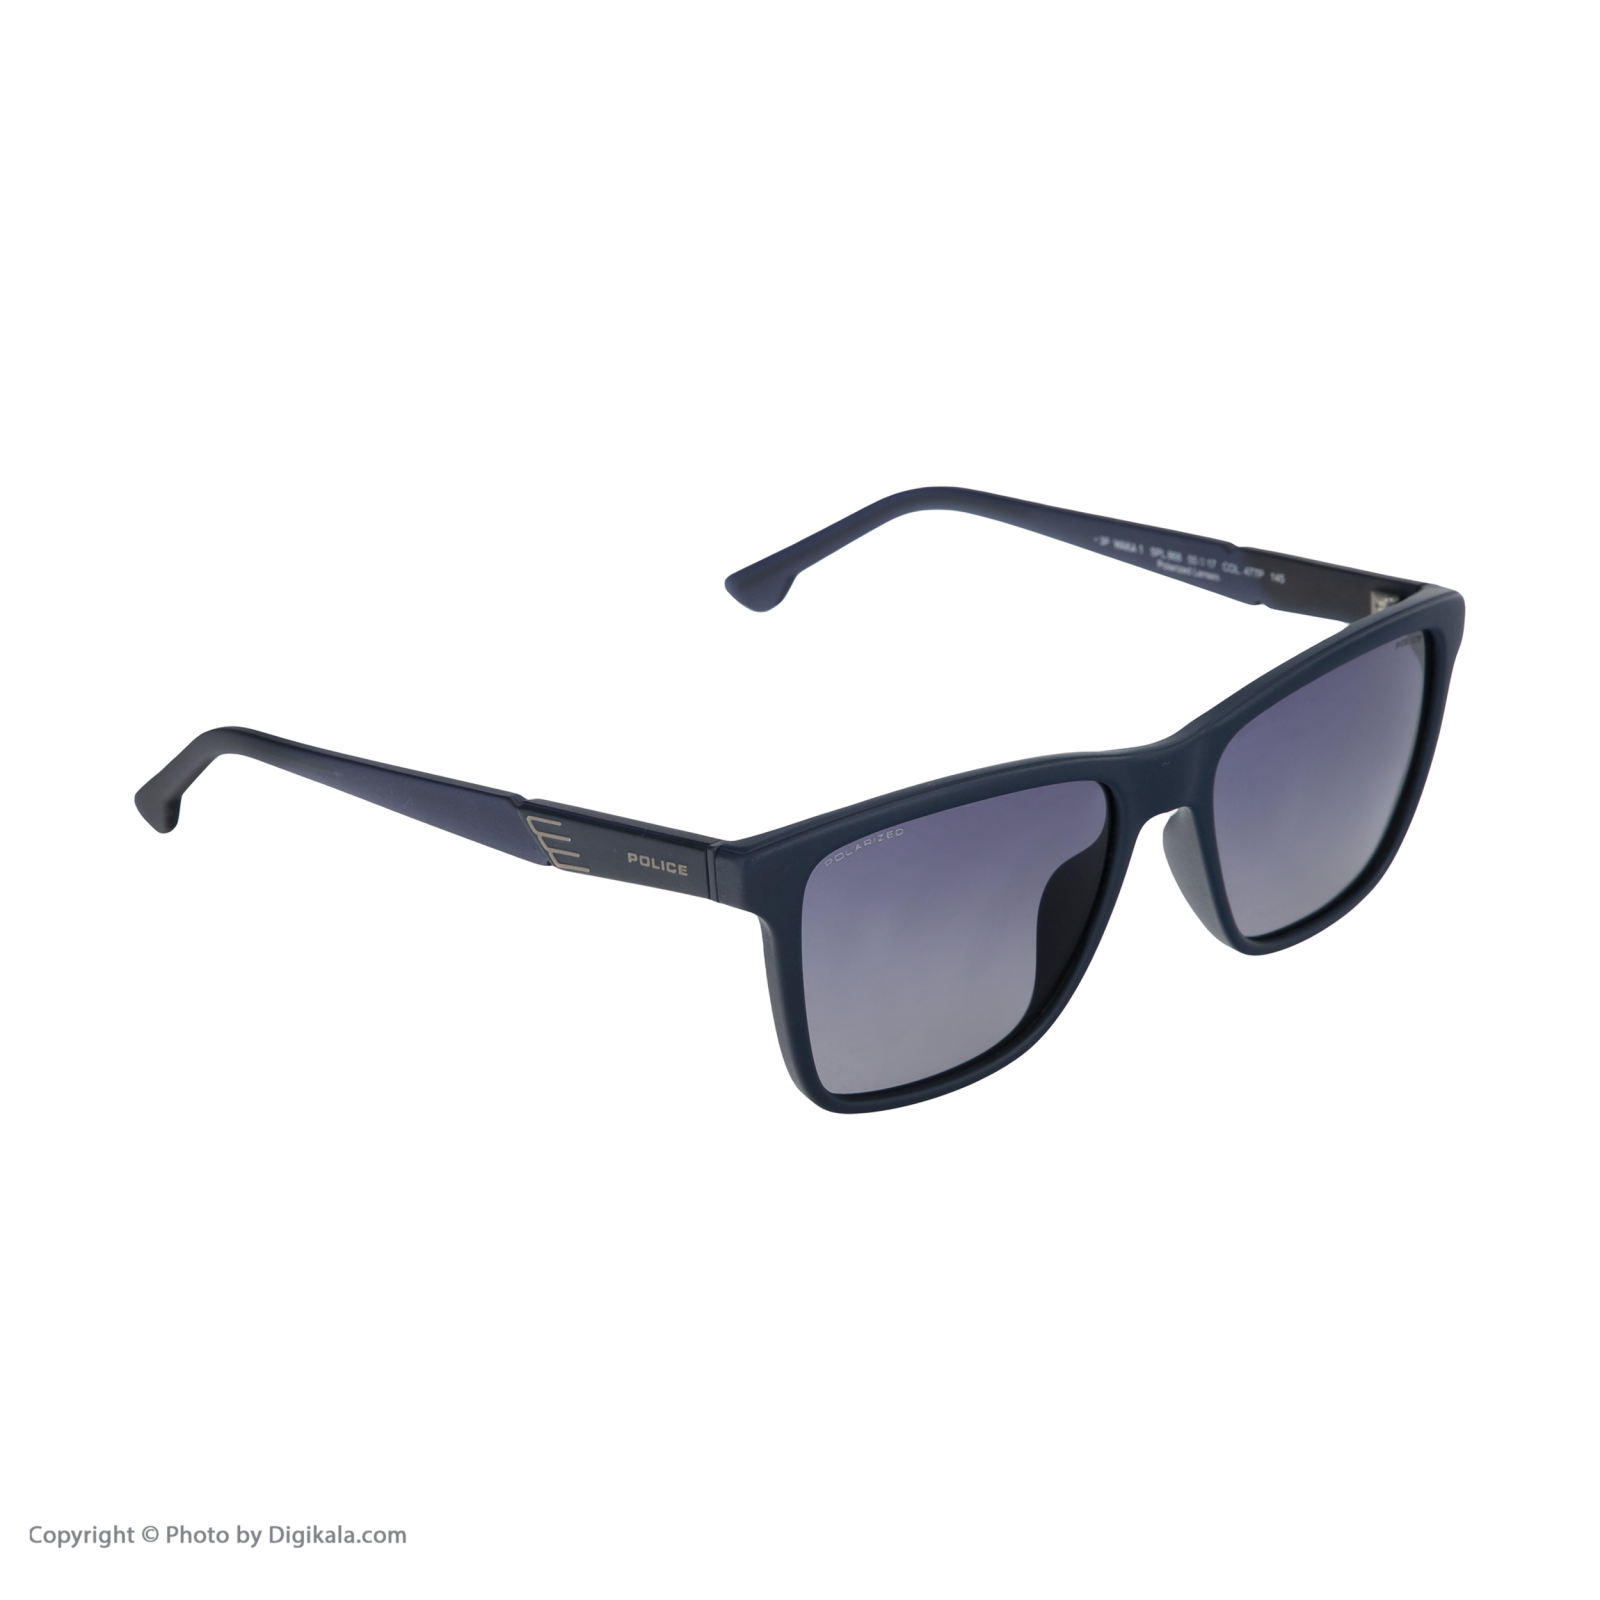 عینک آفتابی پلیس مدل SPL868M 477P -  - 4